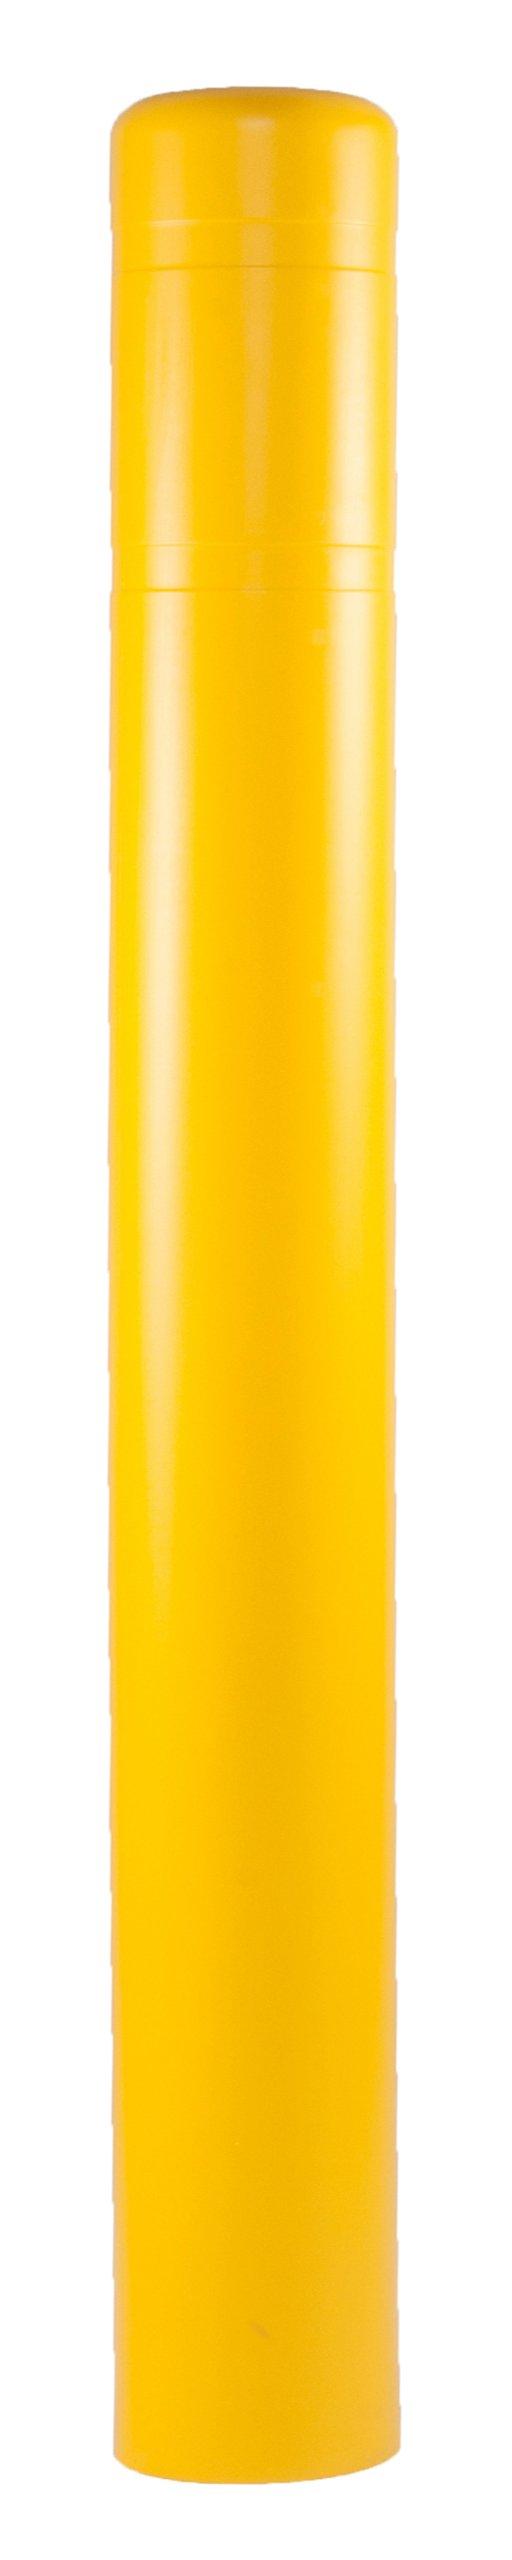 Post Guard CL1386AA Yellow 7'' x 60'' Bollard Cover